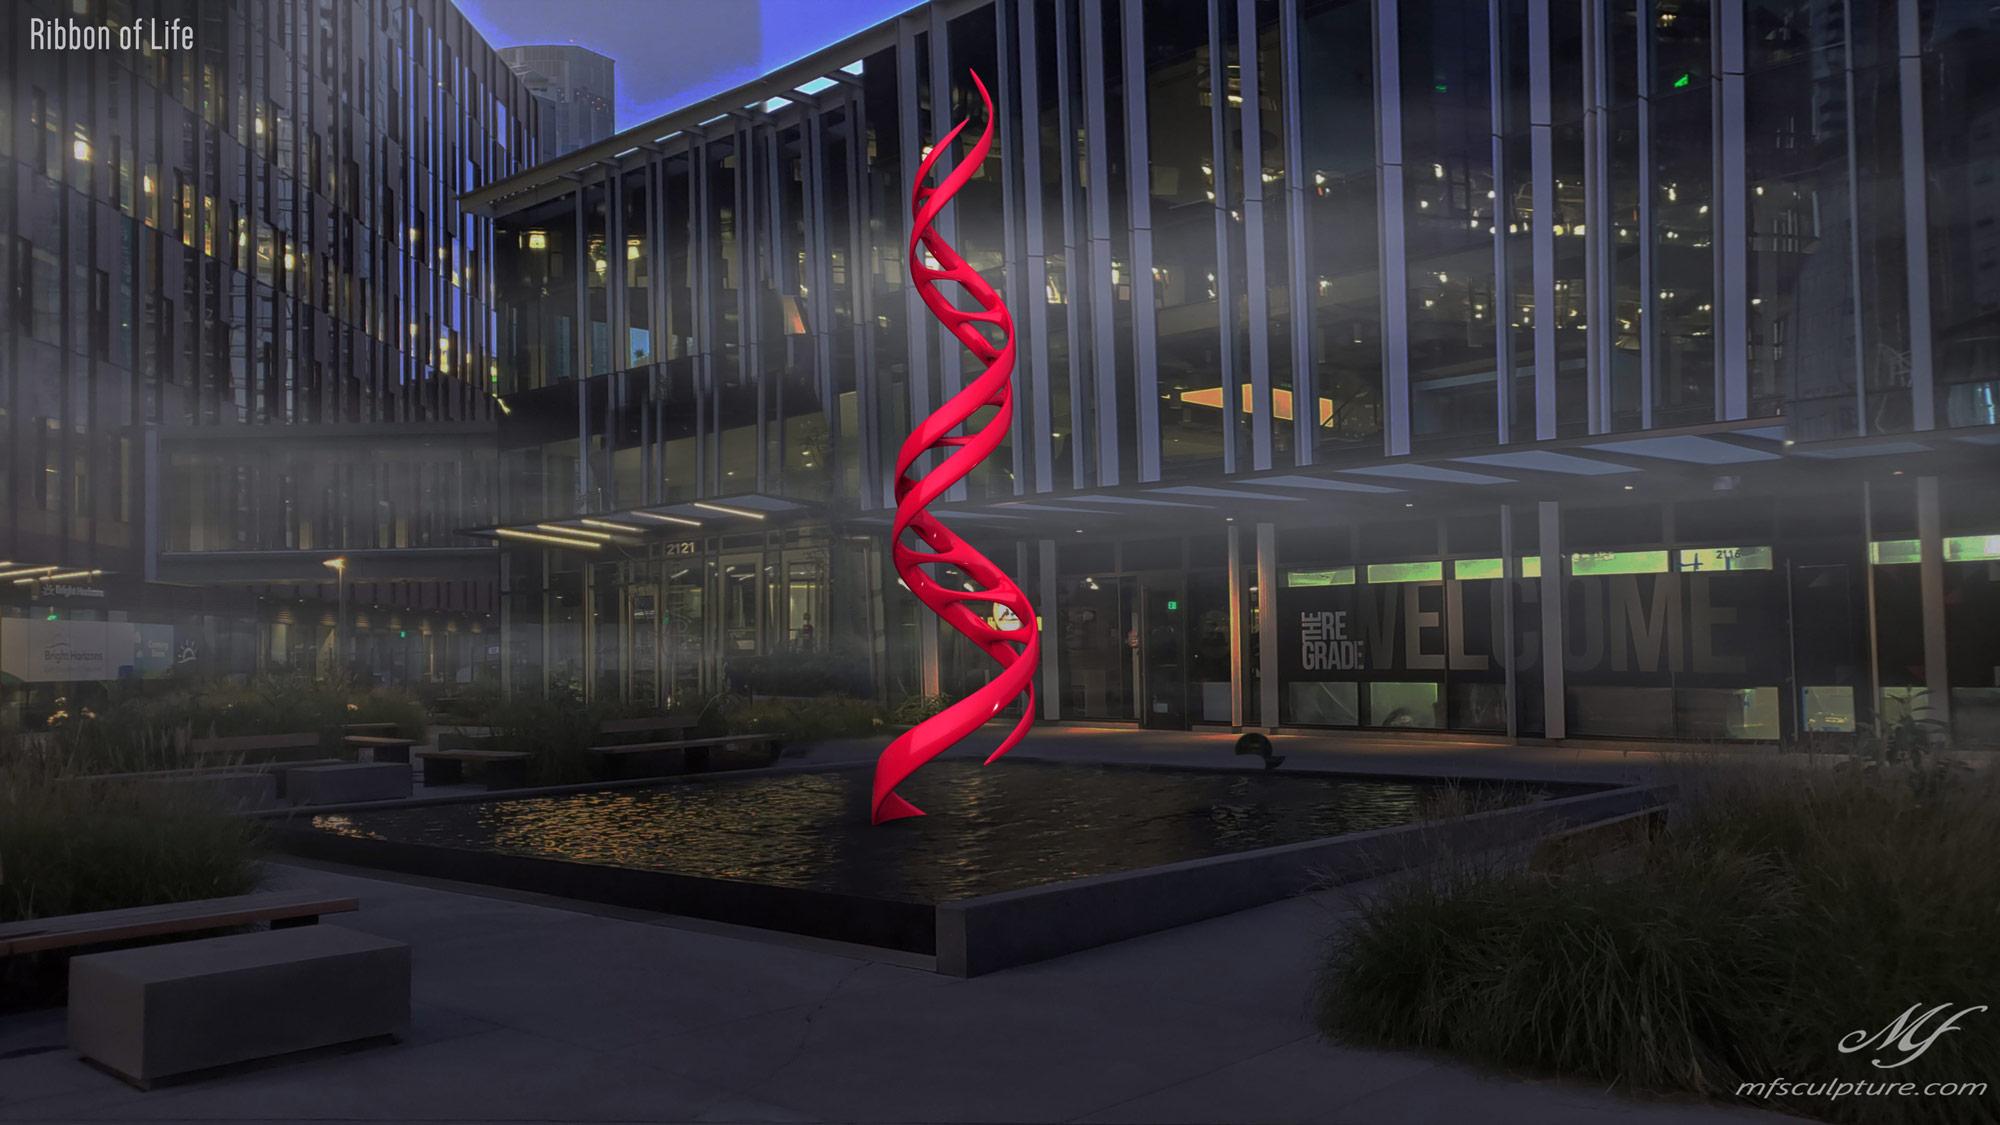 DNA Double Helix Sculpture Contemporary Biology 4